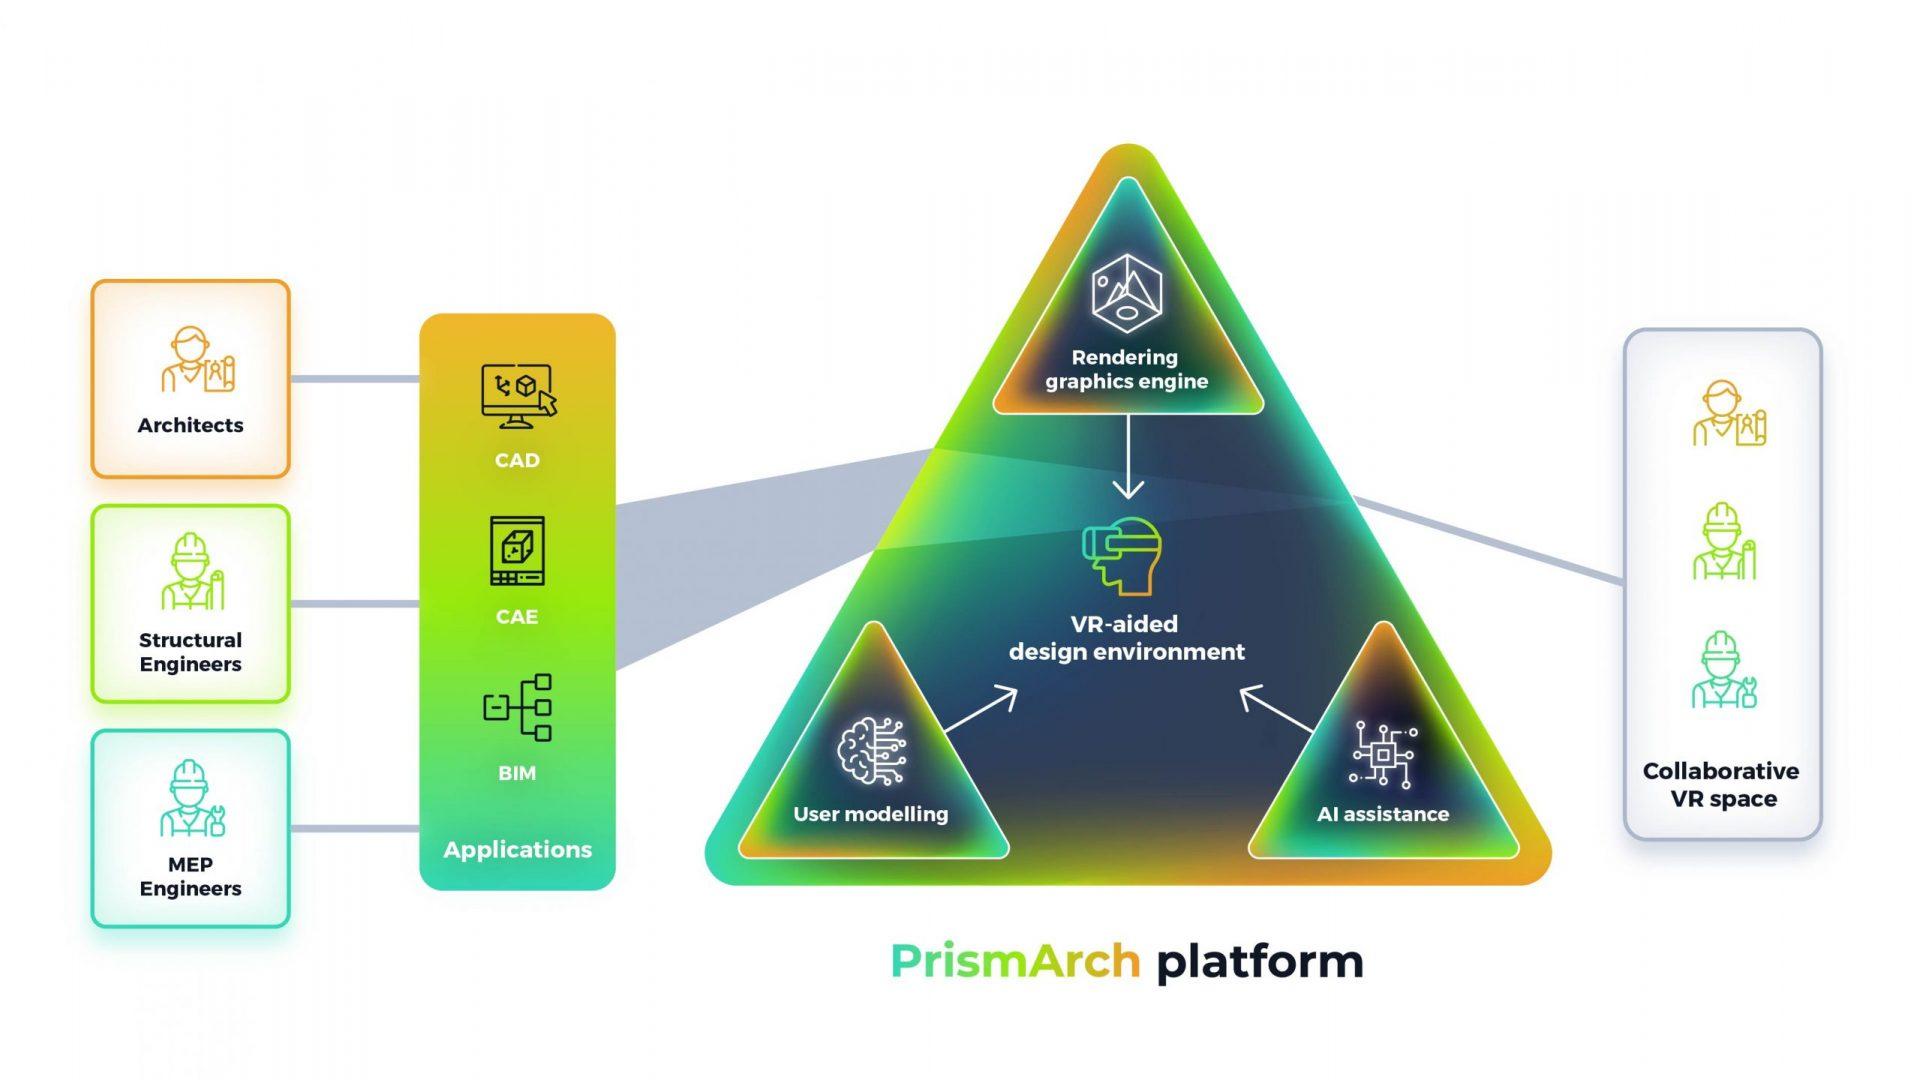 PrismArch